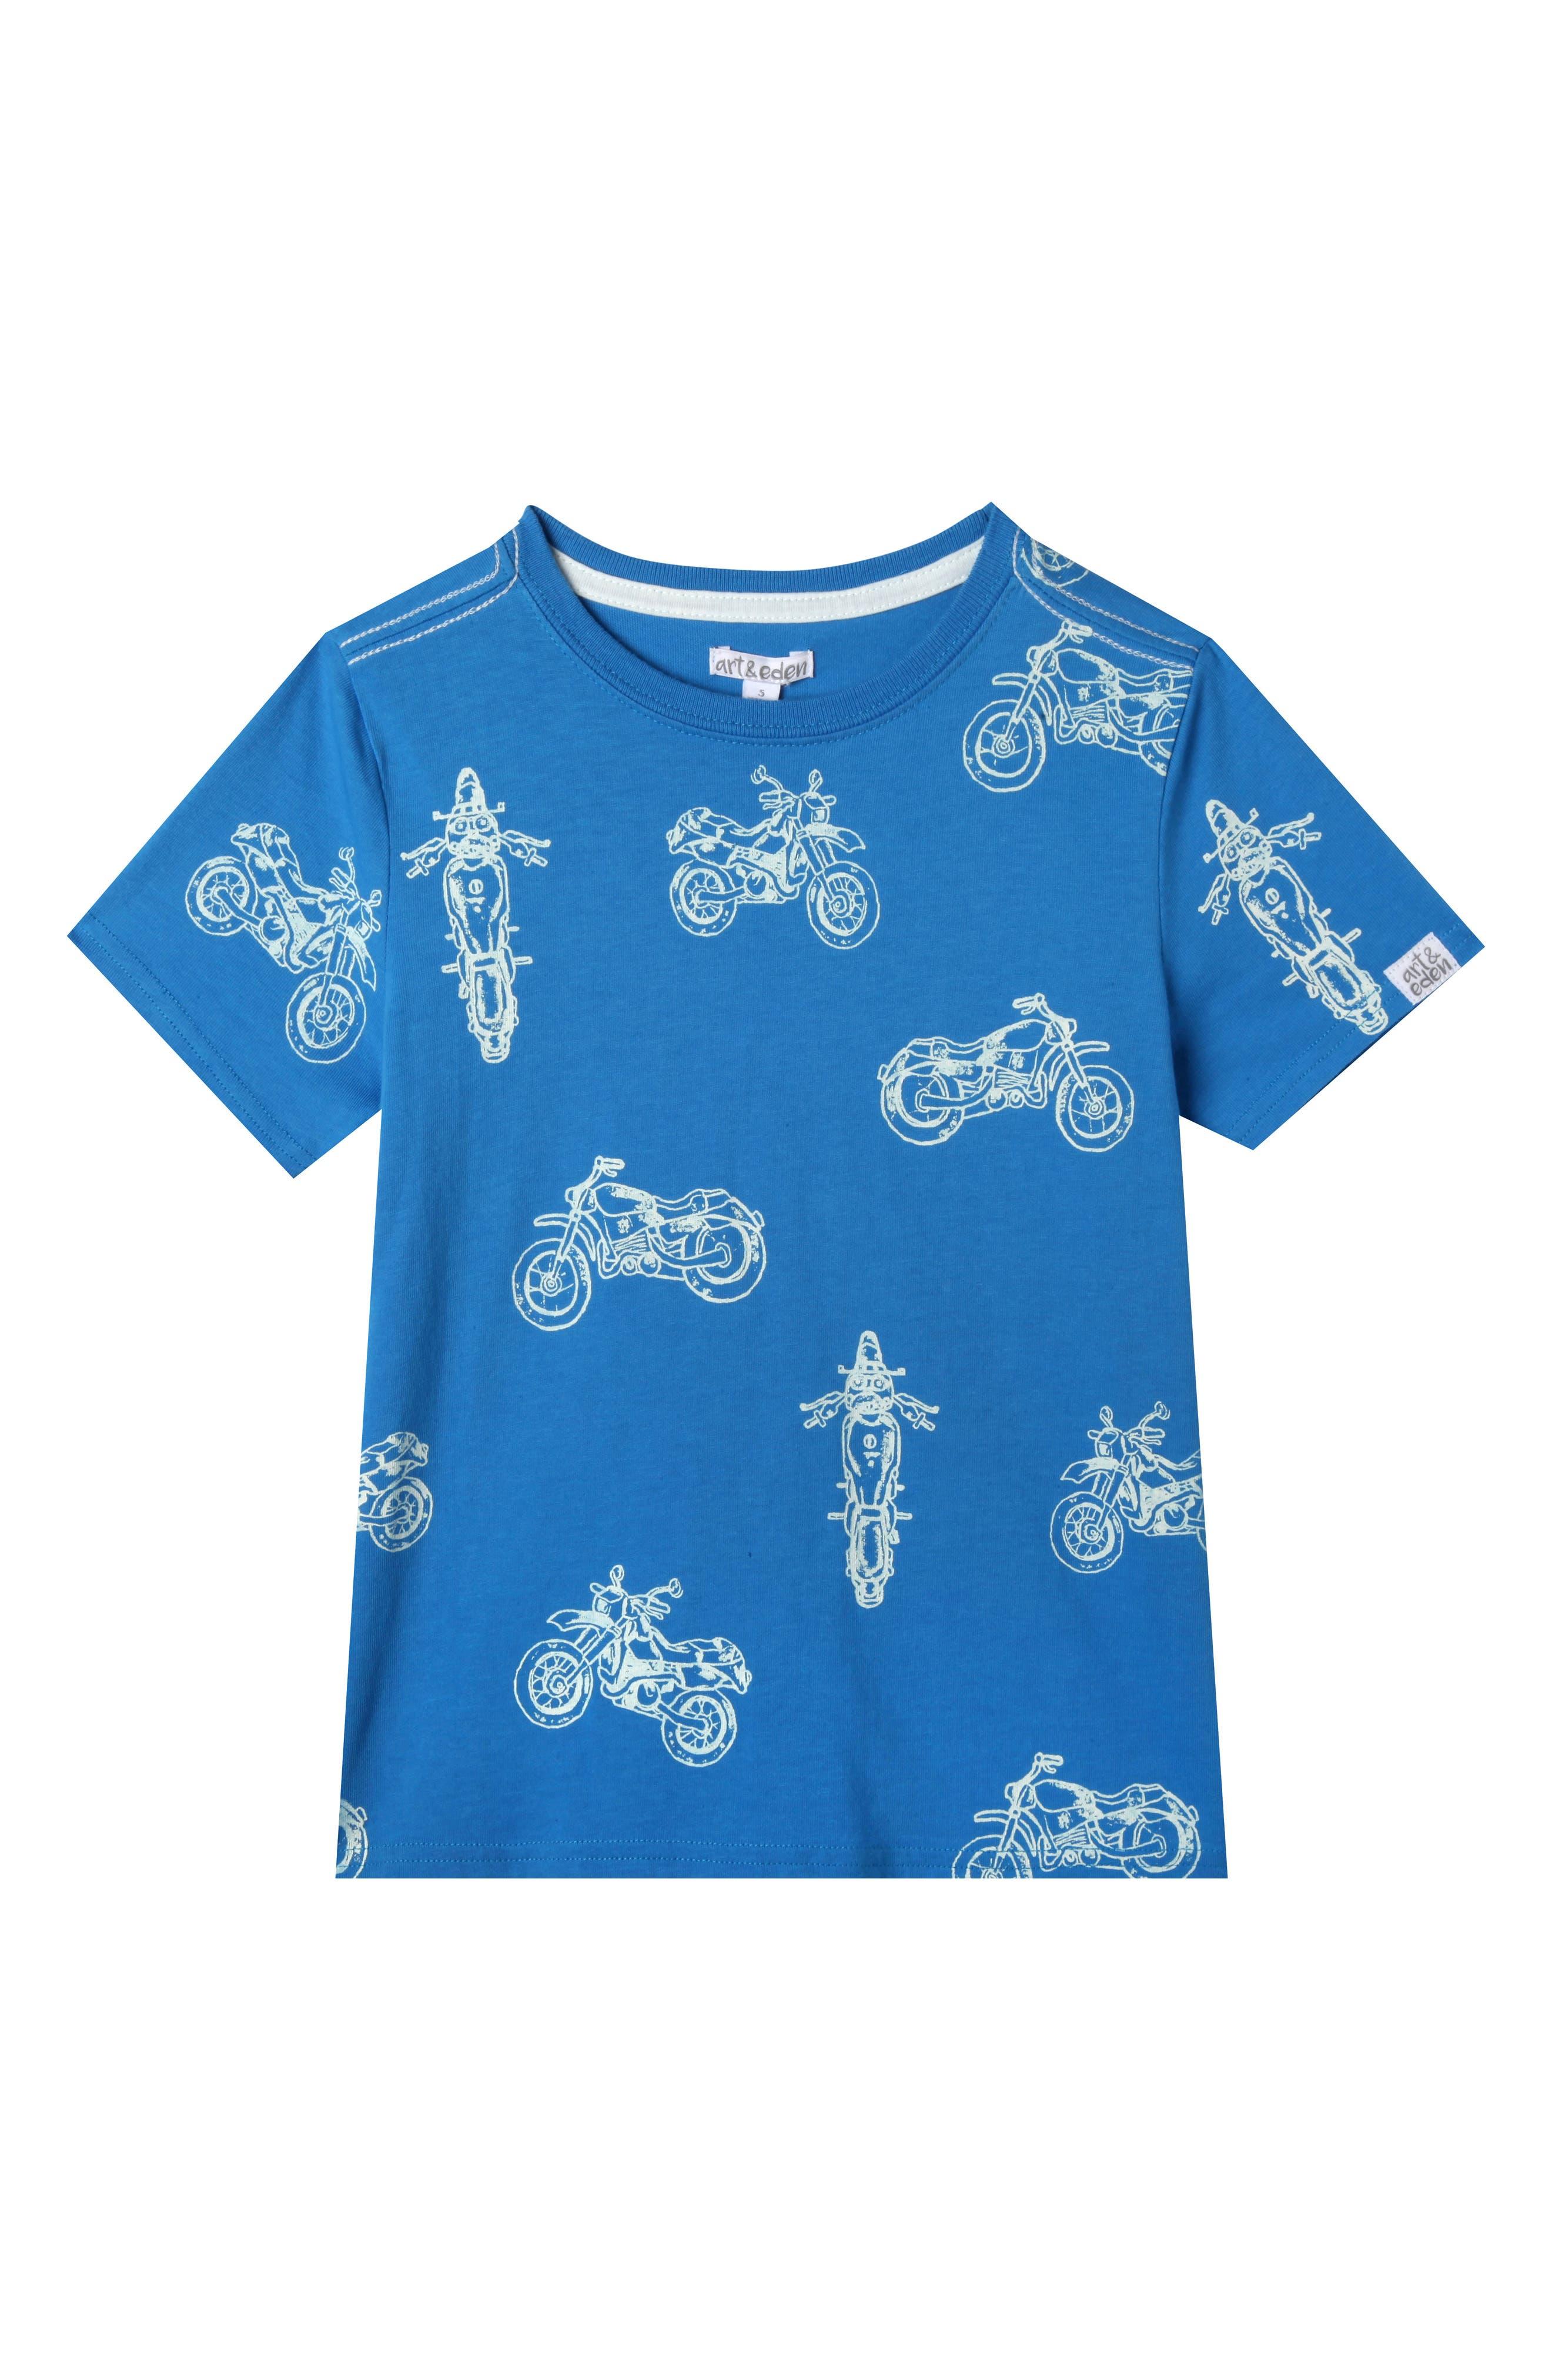 Art & Eden Sebastian Motorcycle Organic Cotton T-Shirt